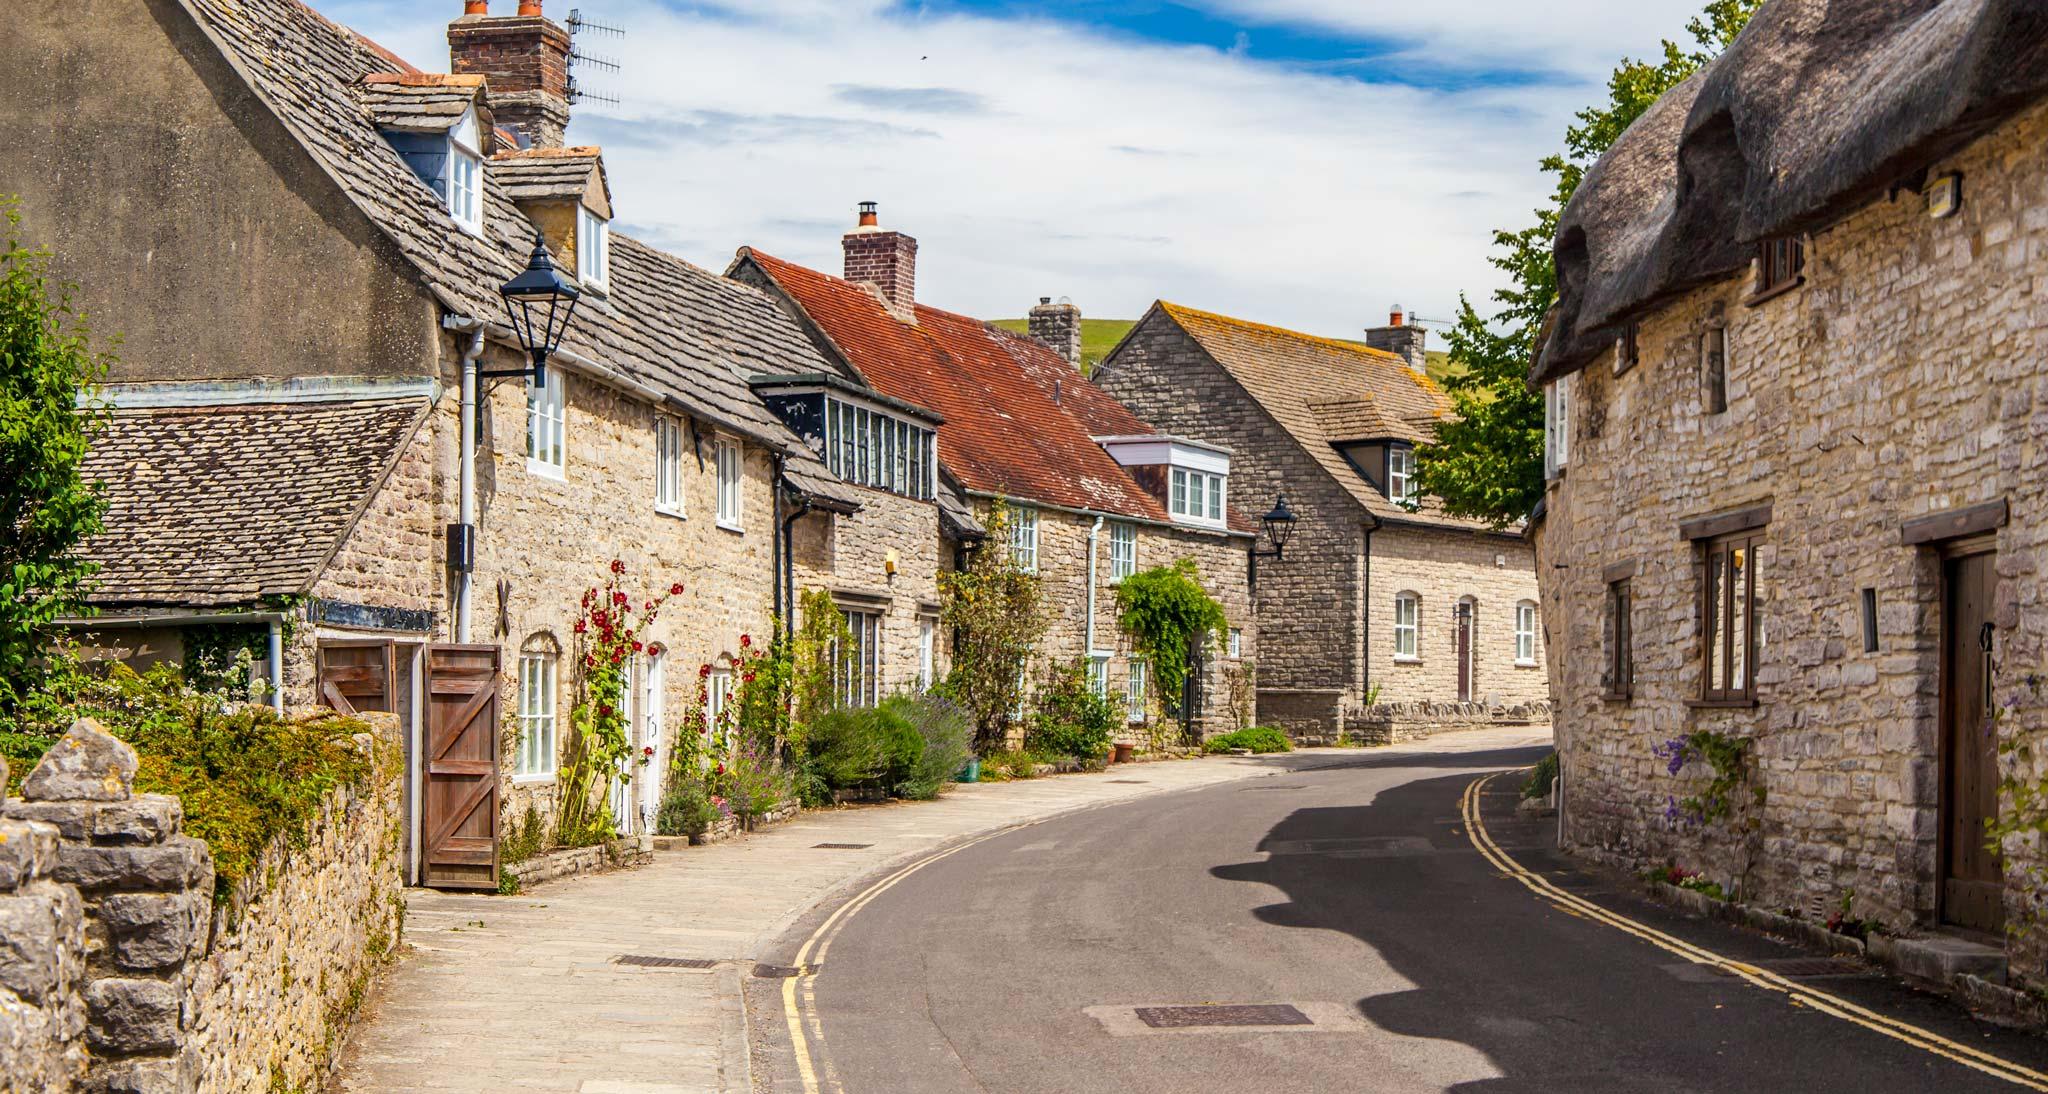 Quaint streets in Dorset